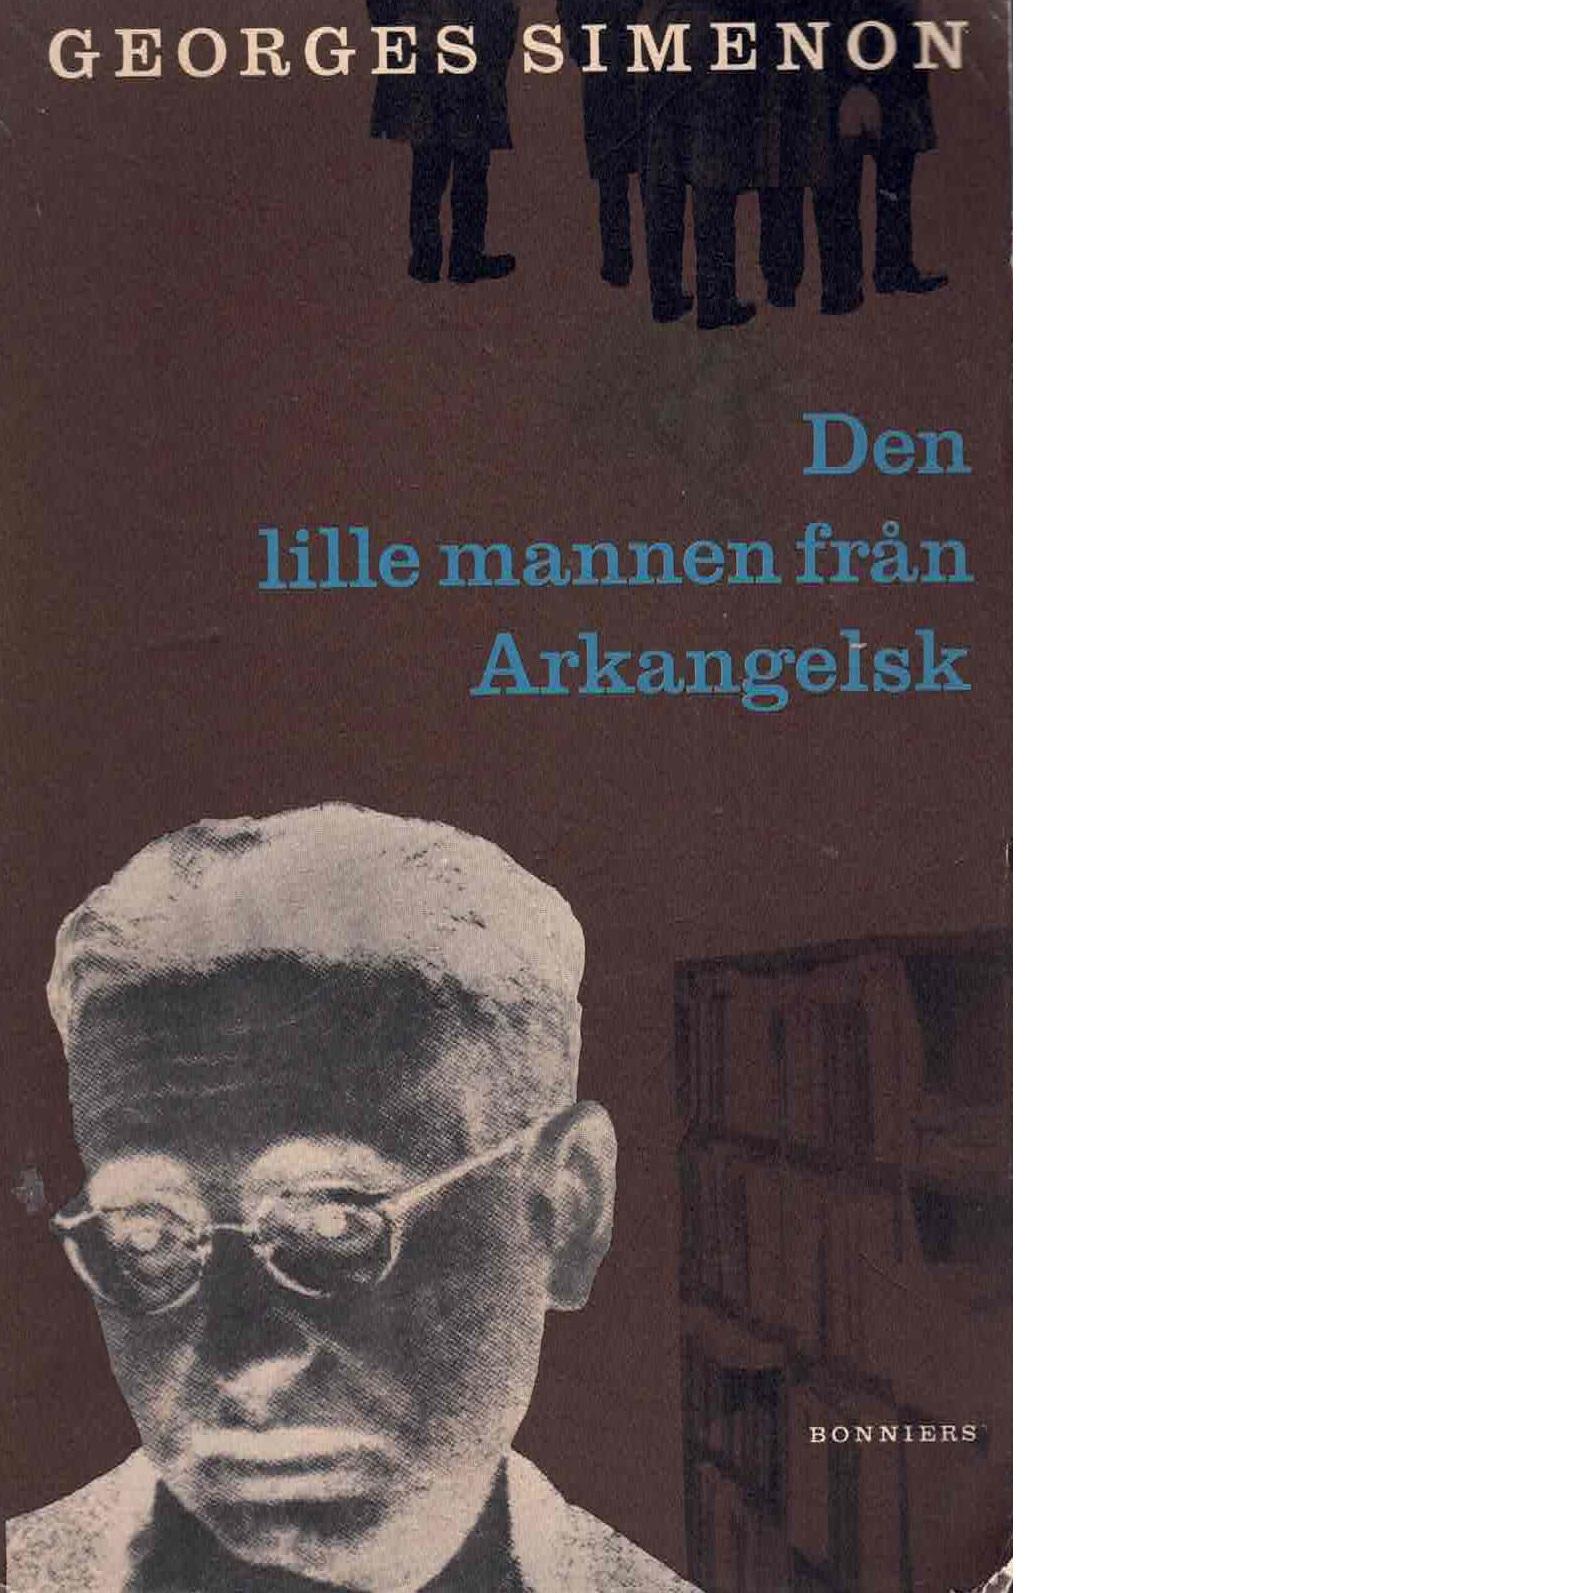 Den lille mannen från Arkangelsk - Simenon, Georges